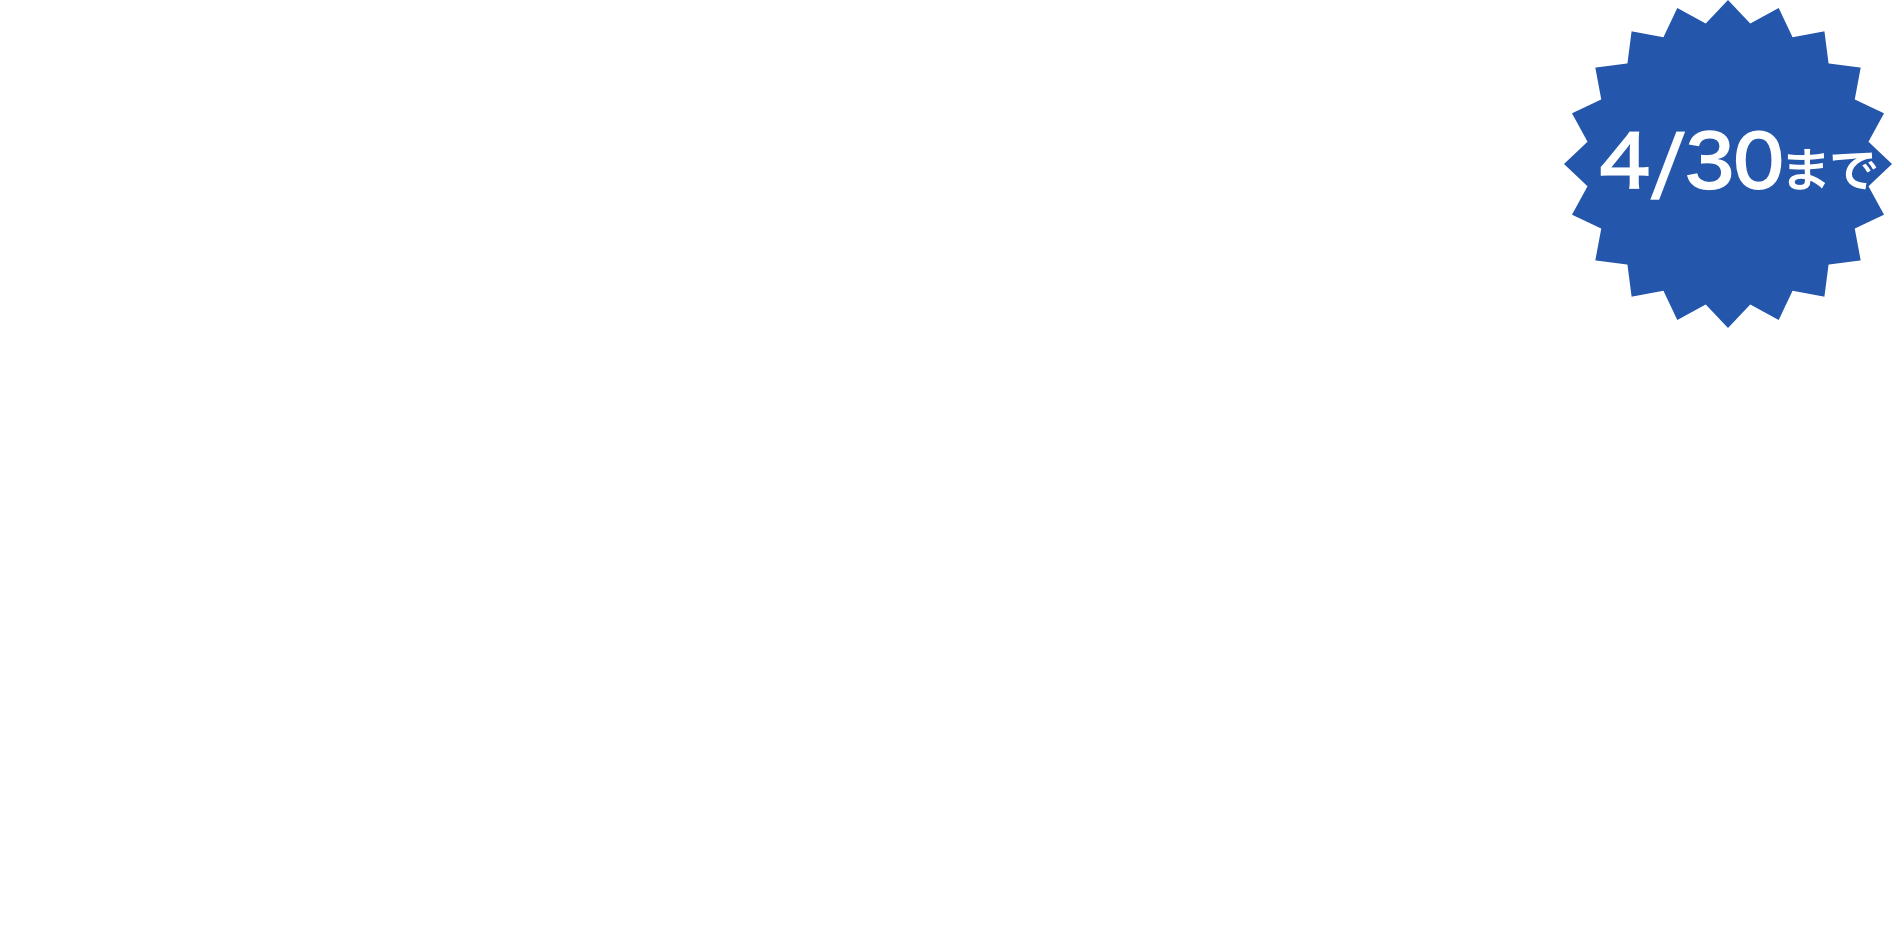 PayPay銀行ビジネスローン新規契約&お借り入れで現金10,000円もれなくもらえる!